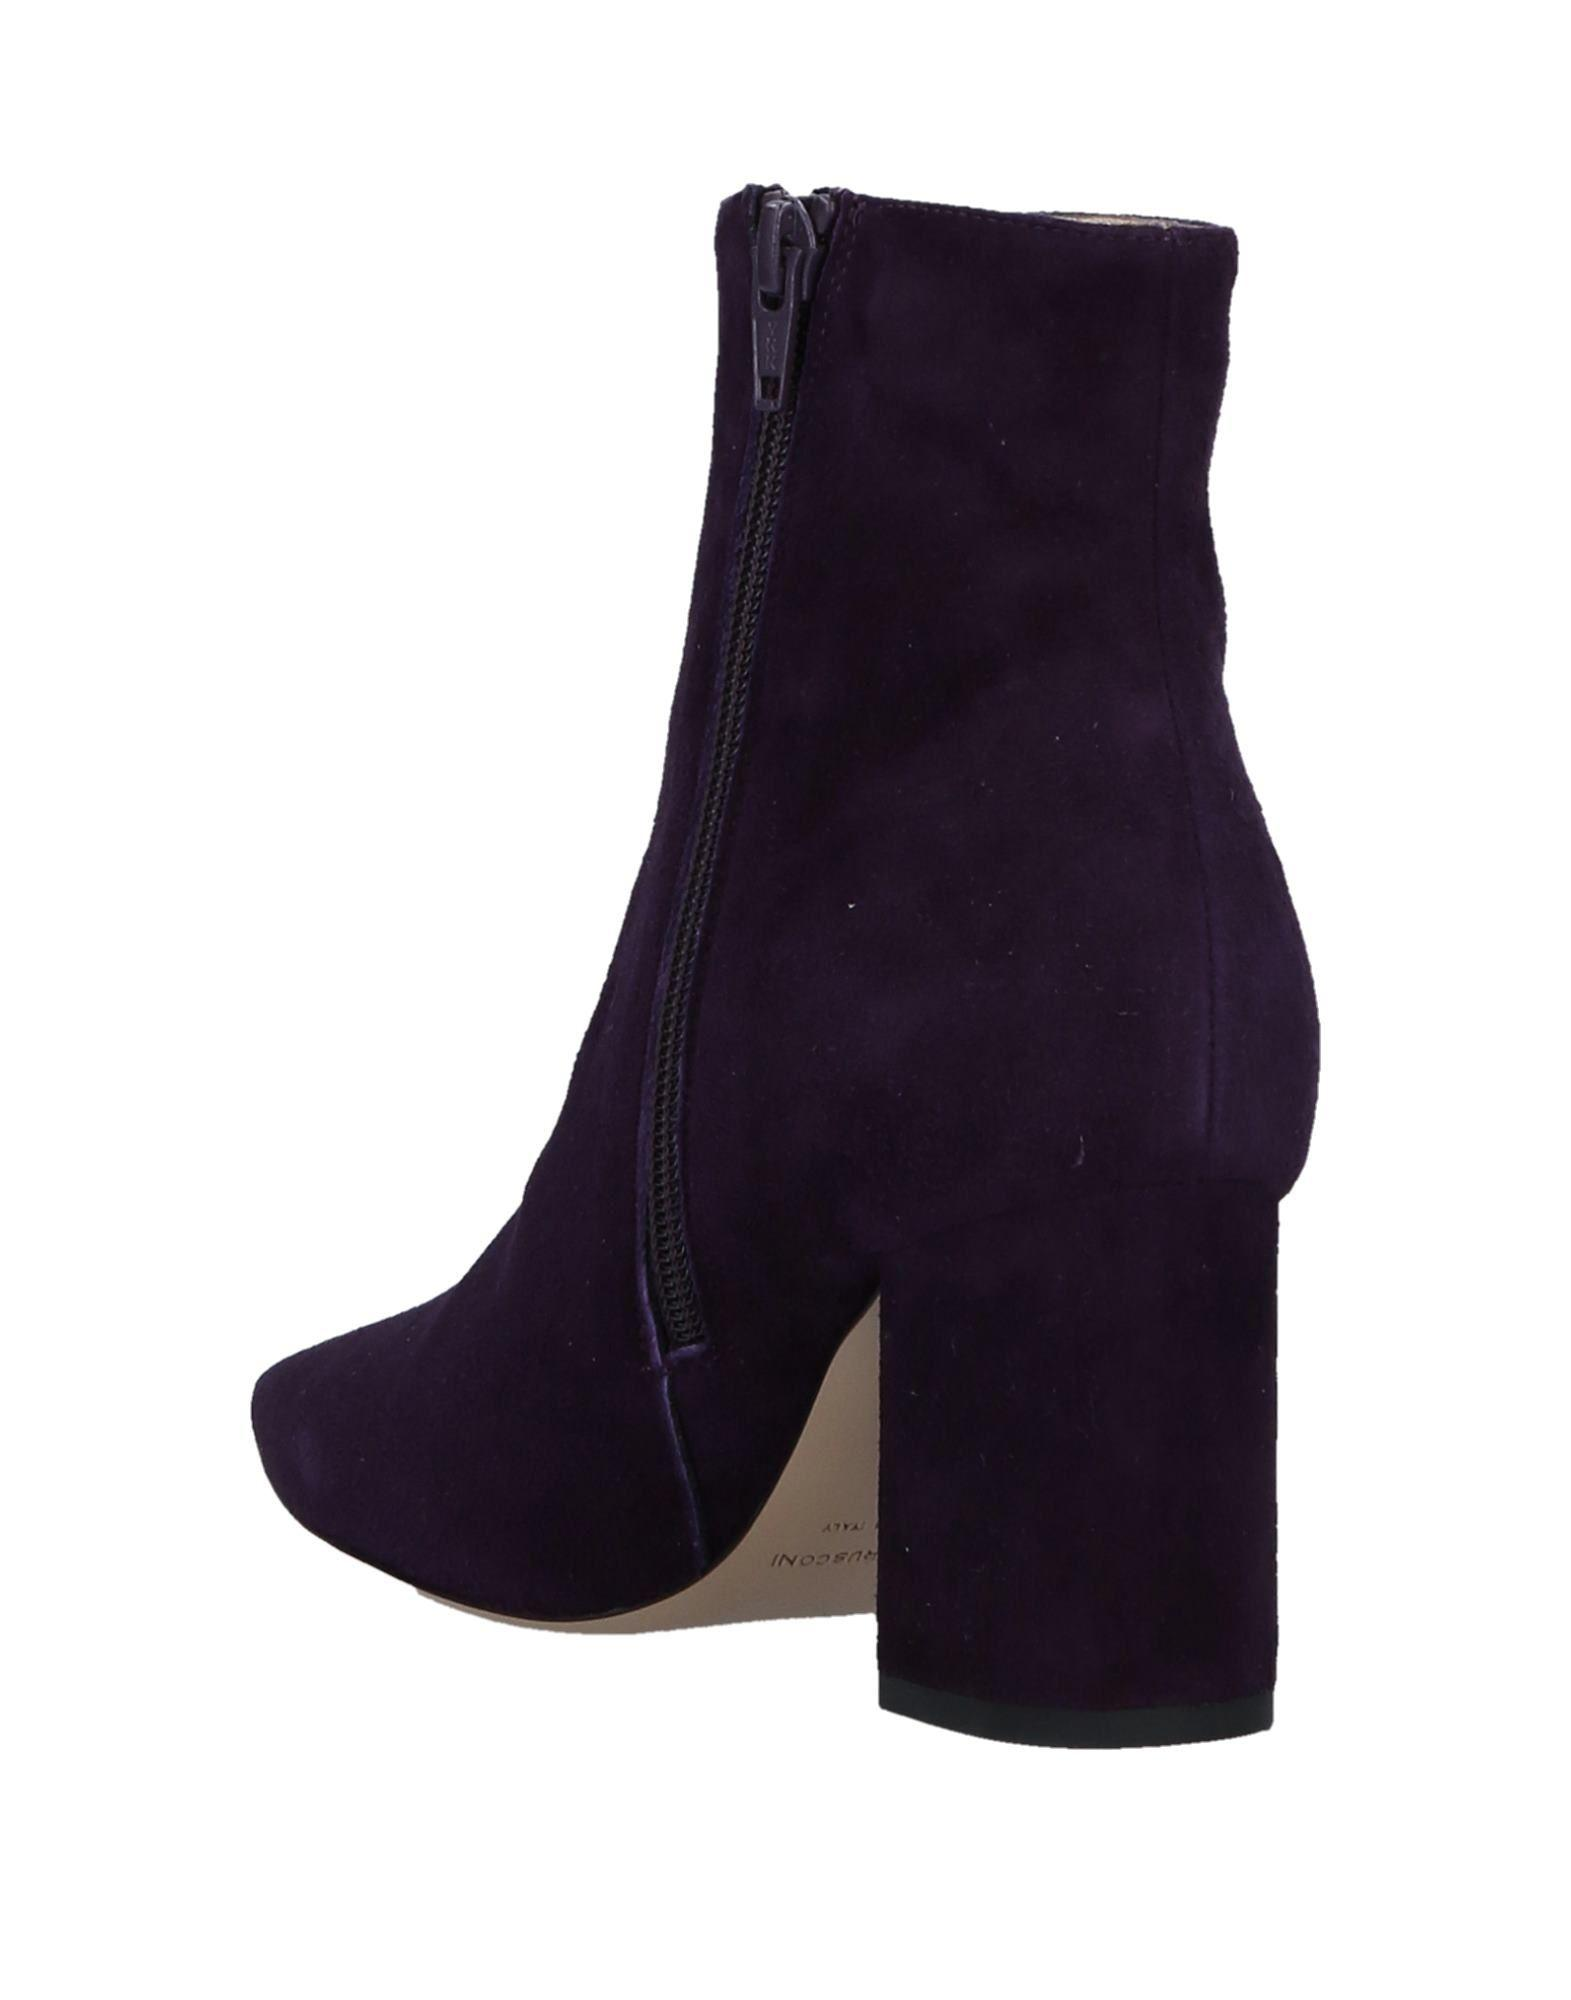 Fabio Rusconi Suede Ankle Boots in Purple